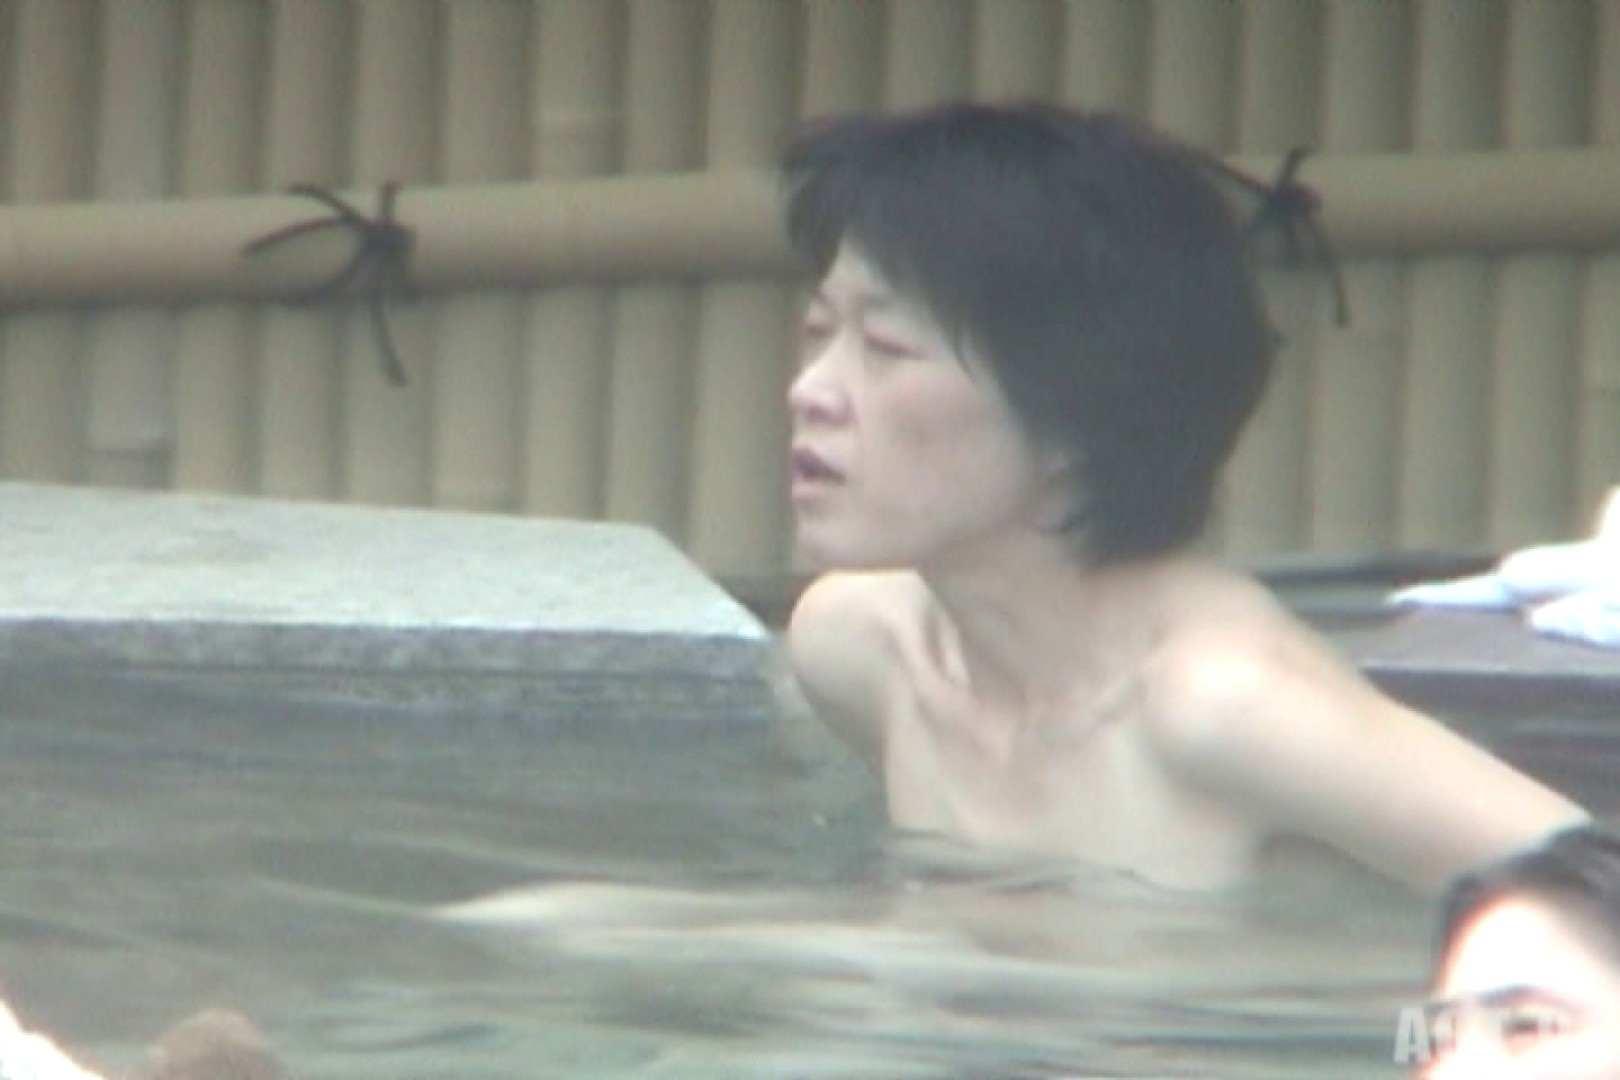 Aquaな露天風呂Vol.717 露天風呂編  111PIX 42